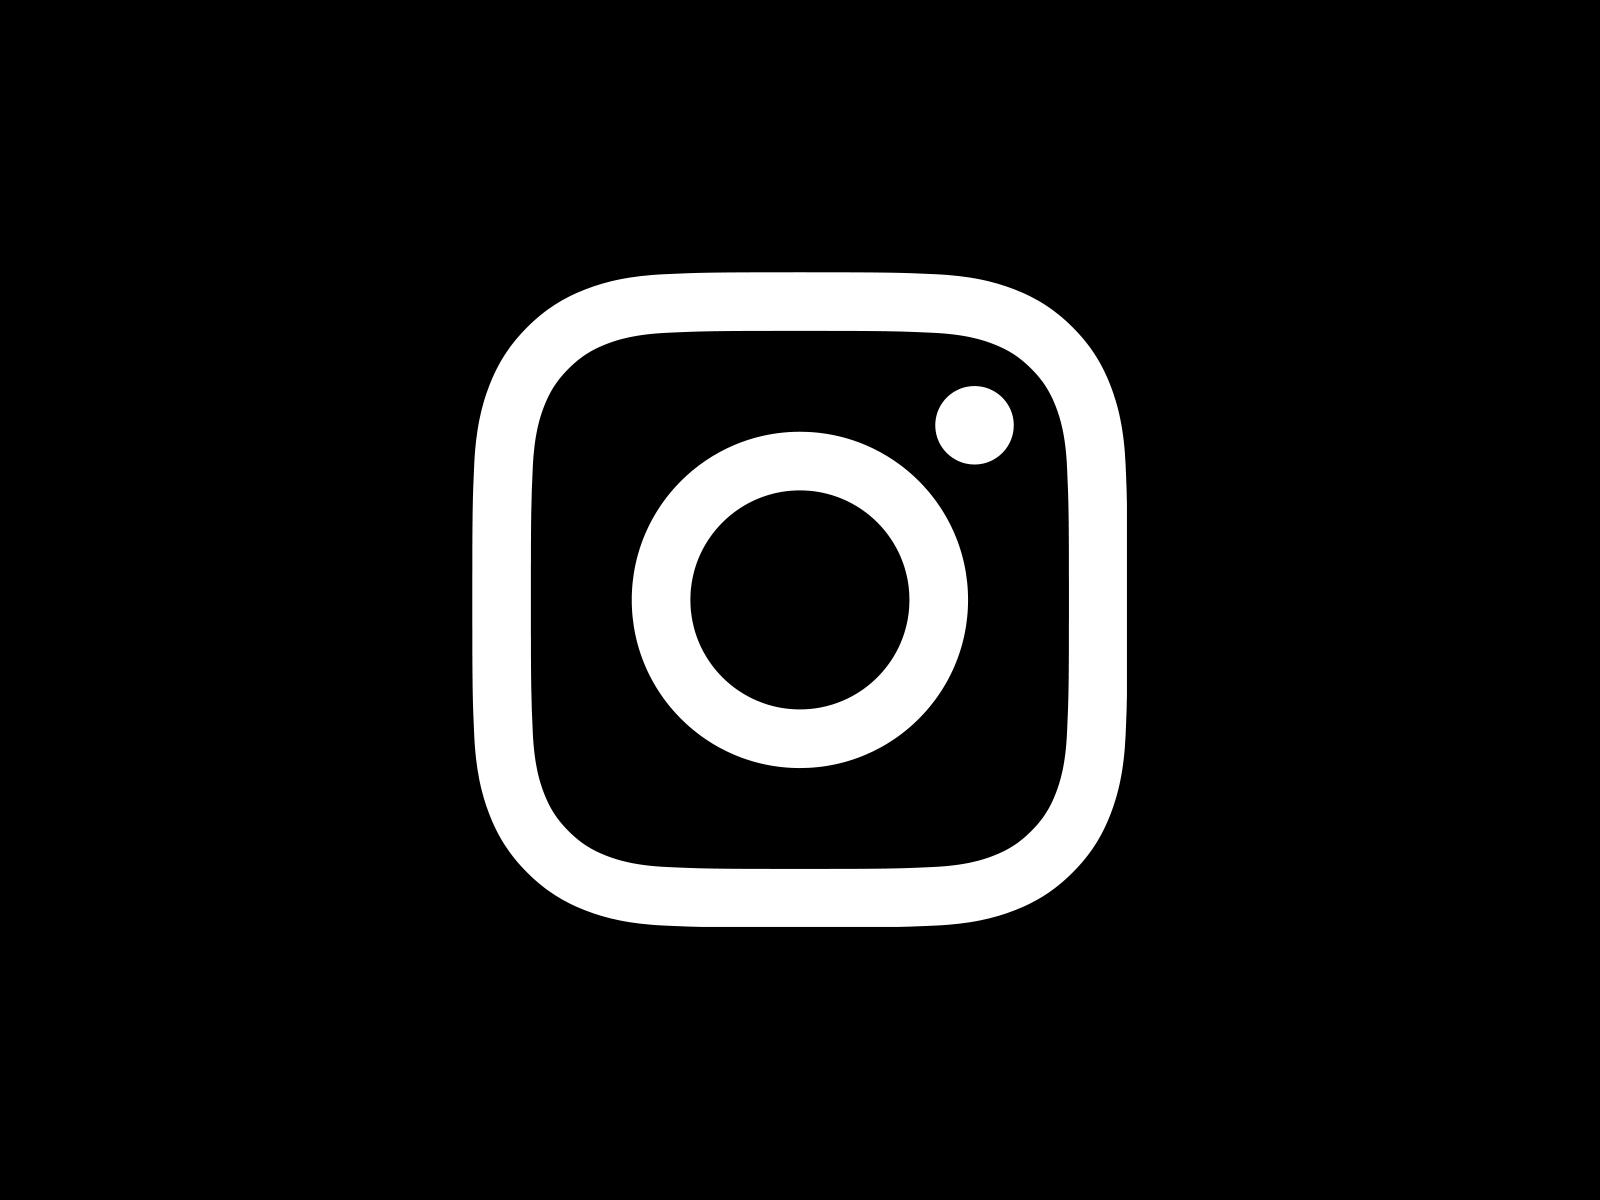 Instagram Logo Google Search Instagram Logo New Instagram Logo Instagram Logo Transparent